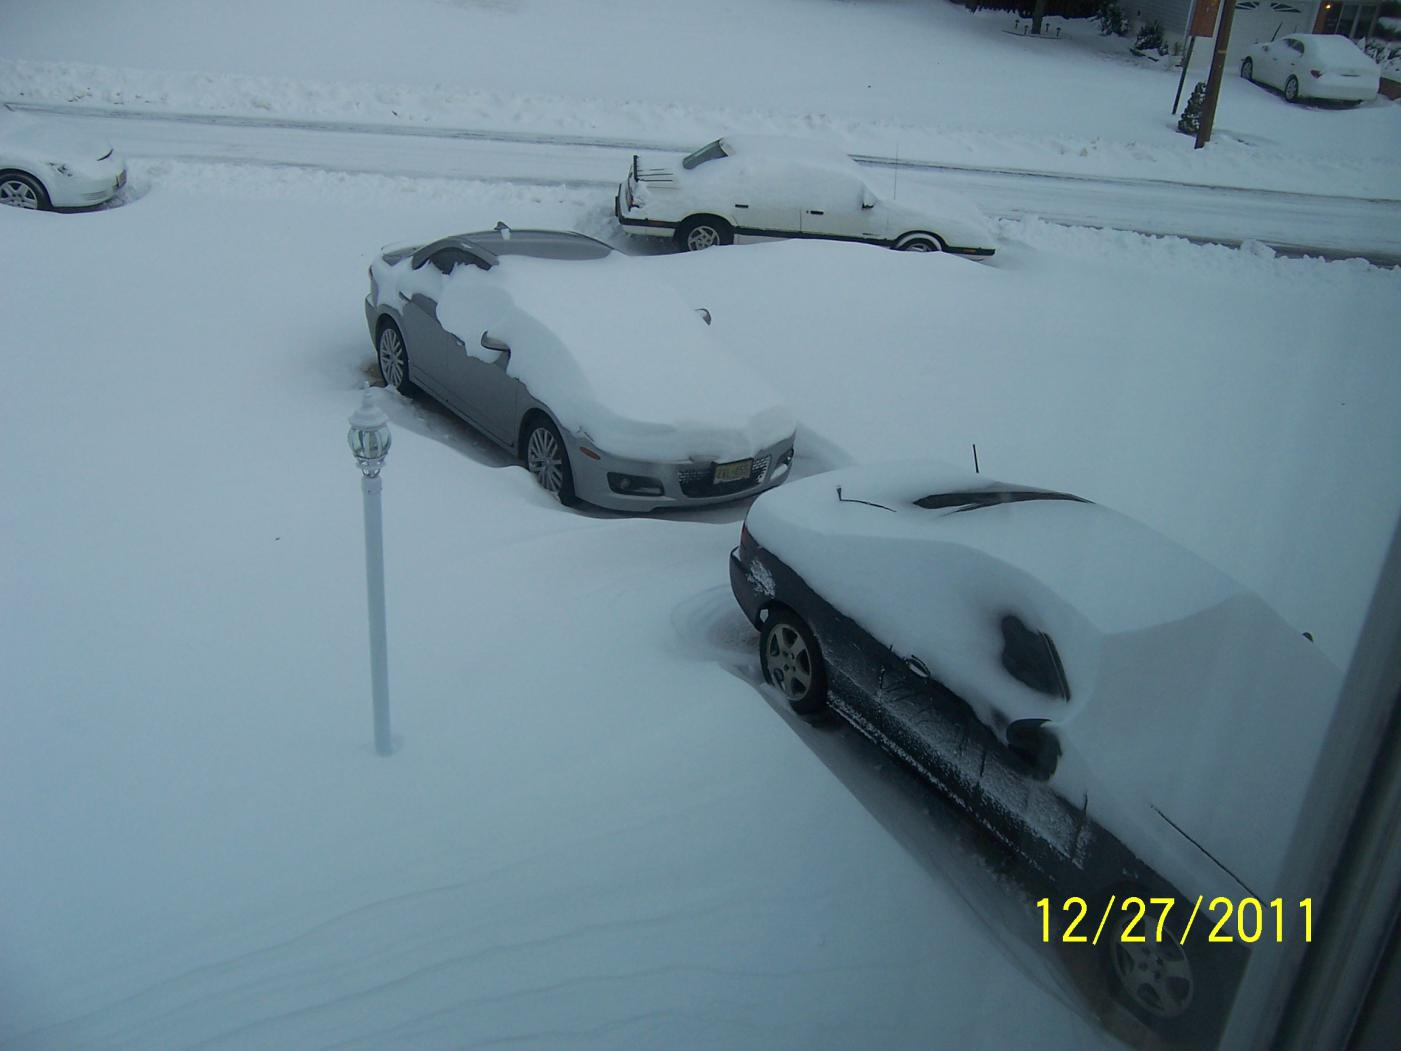 Offical snow pic thread-106_2590.jpg